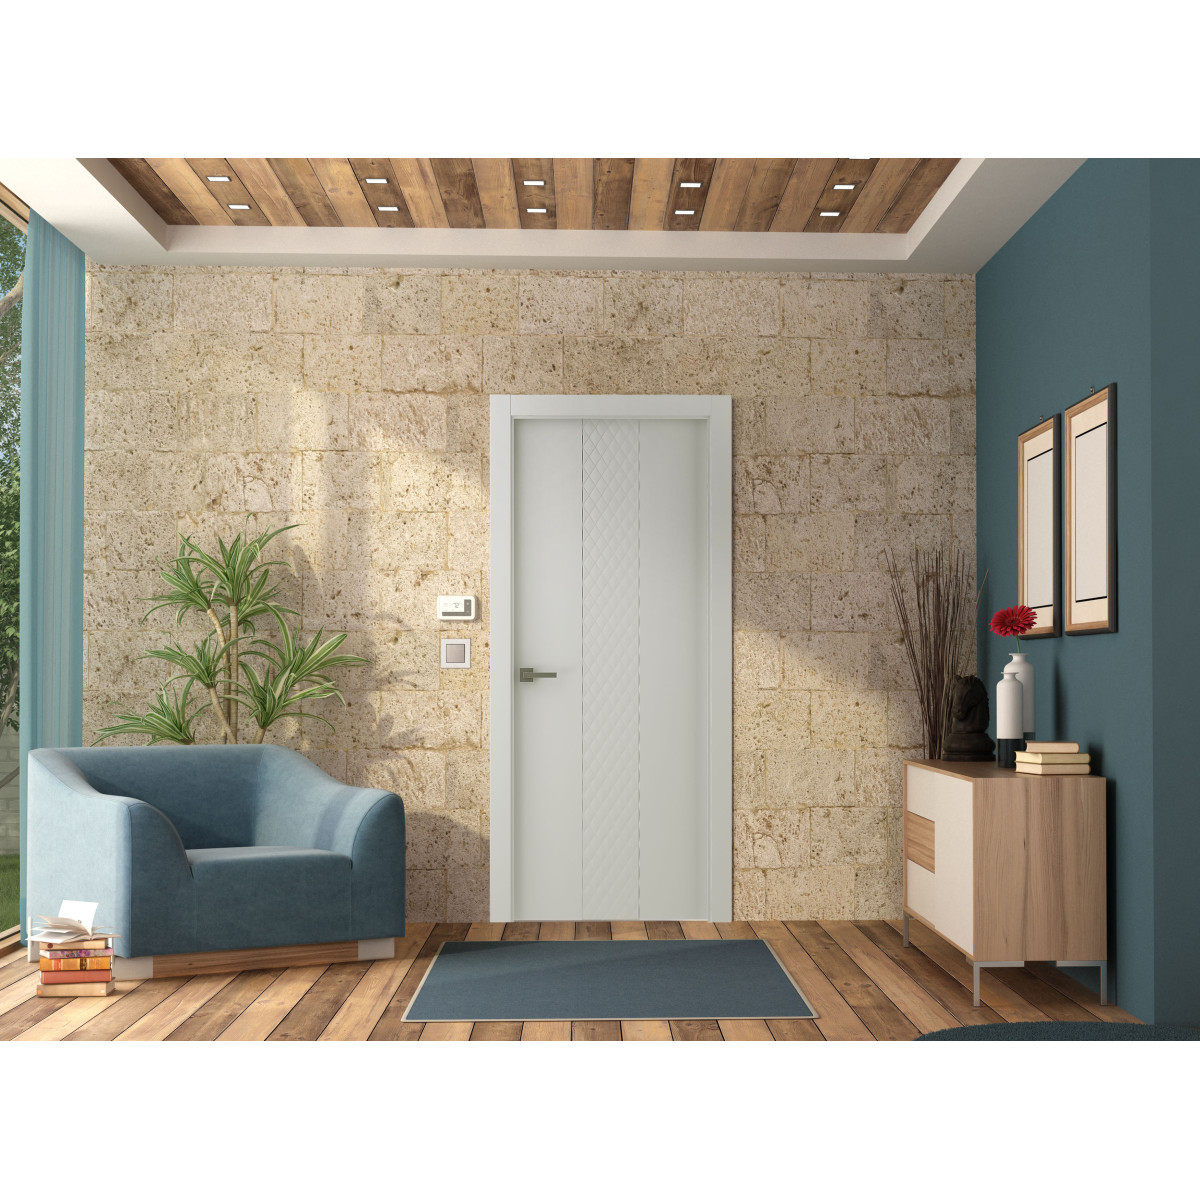 Дверь Межкомнатная Глухая С Замком В Комплекте Халика 80x200 Экошпон Цвет Белый